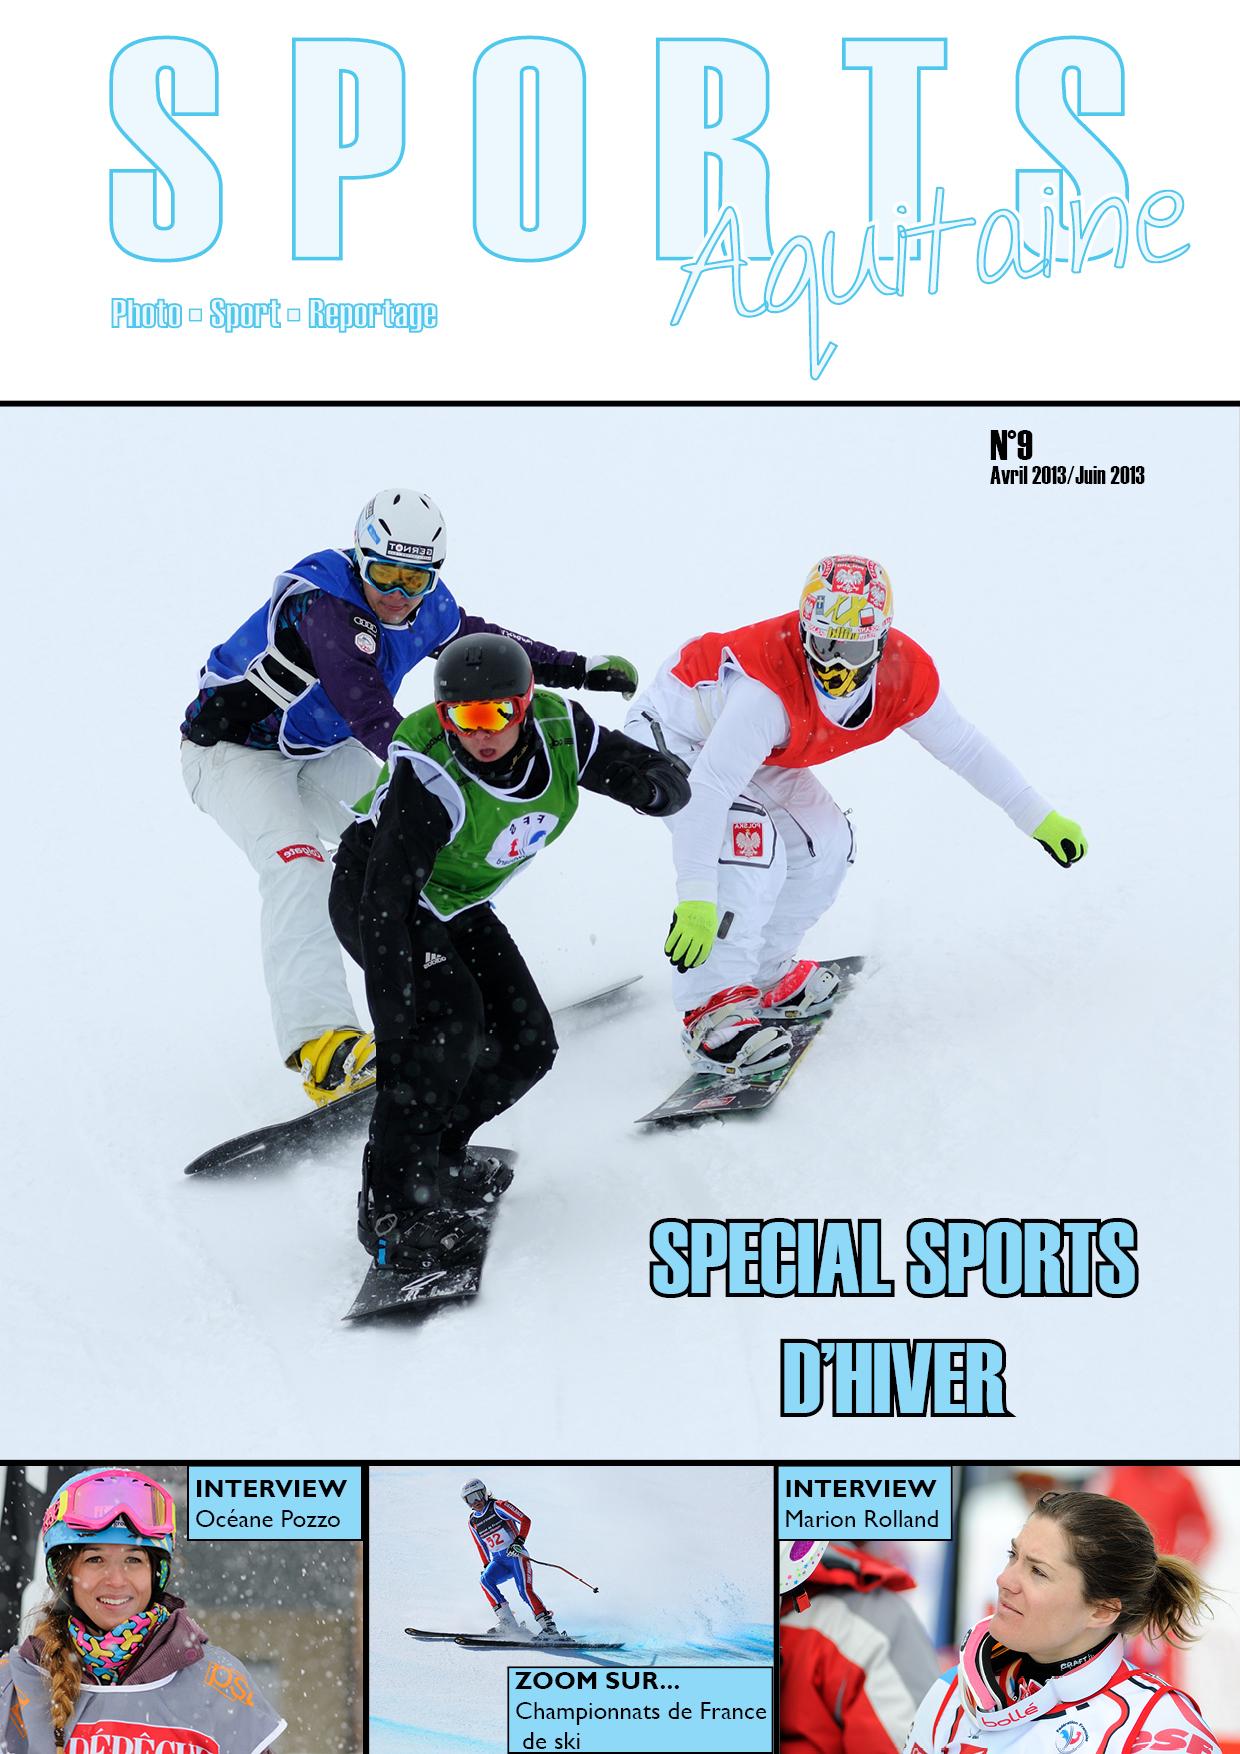 Magazine Sports Aquitaine N°9 - Spécial Sports d'hiver - Ski - Snowboard Cross - Marion Rolland - Océane Pozzo